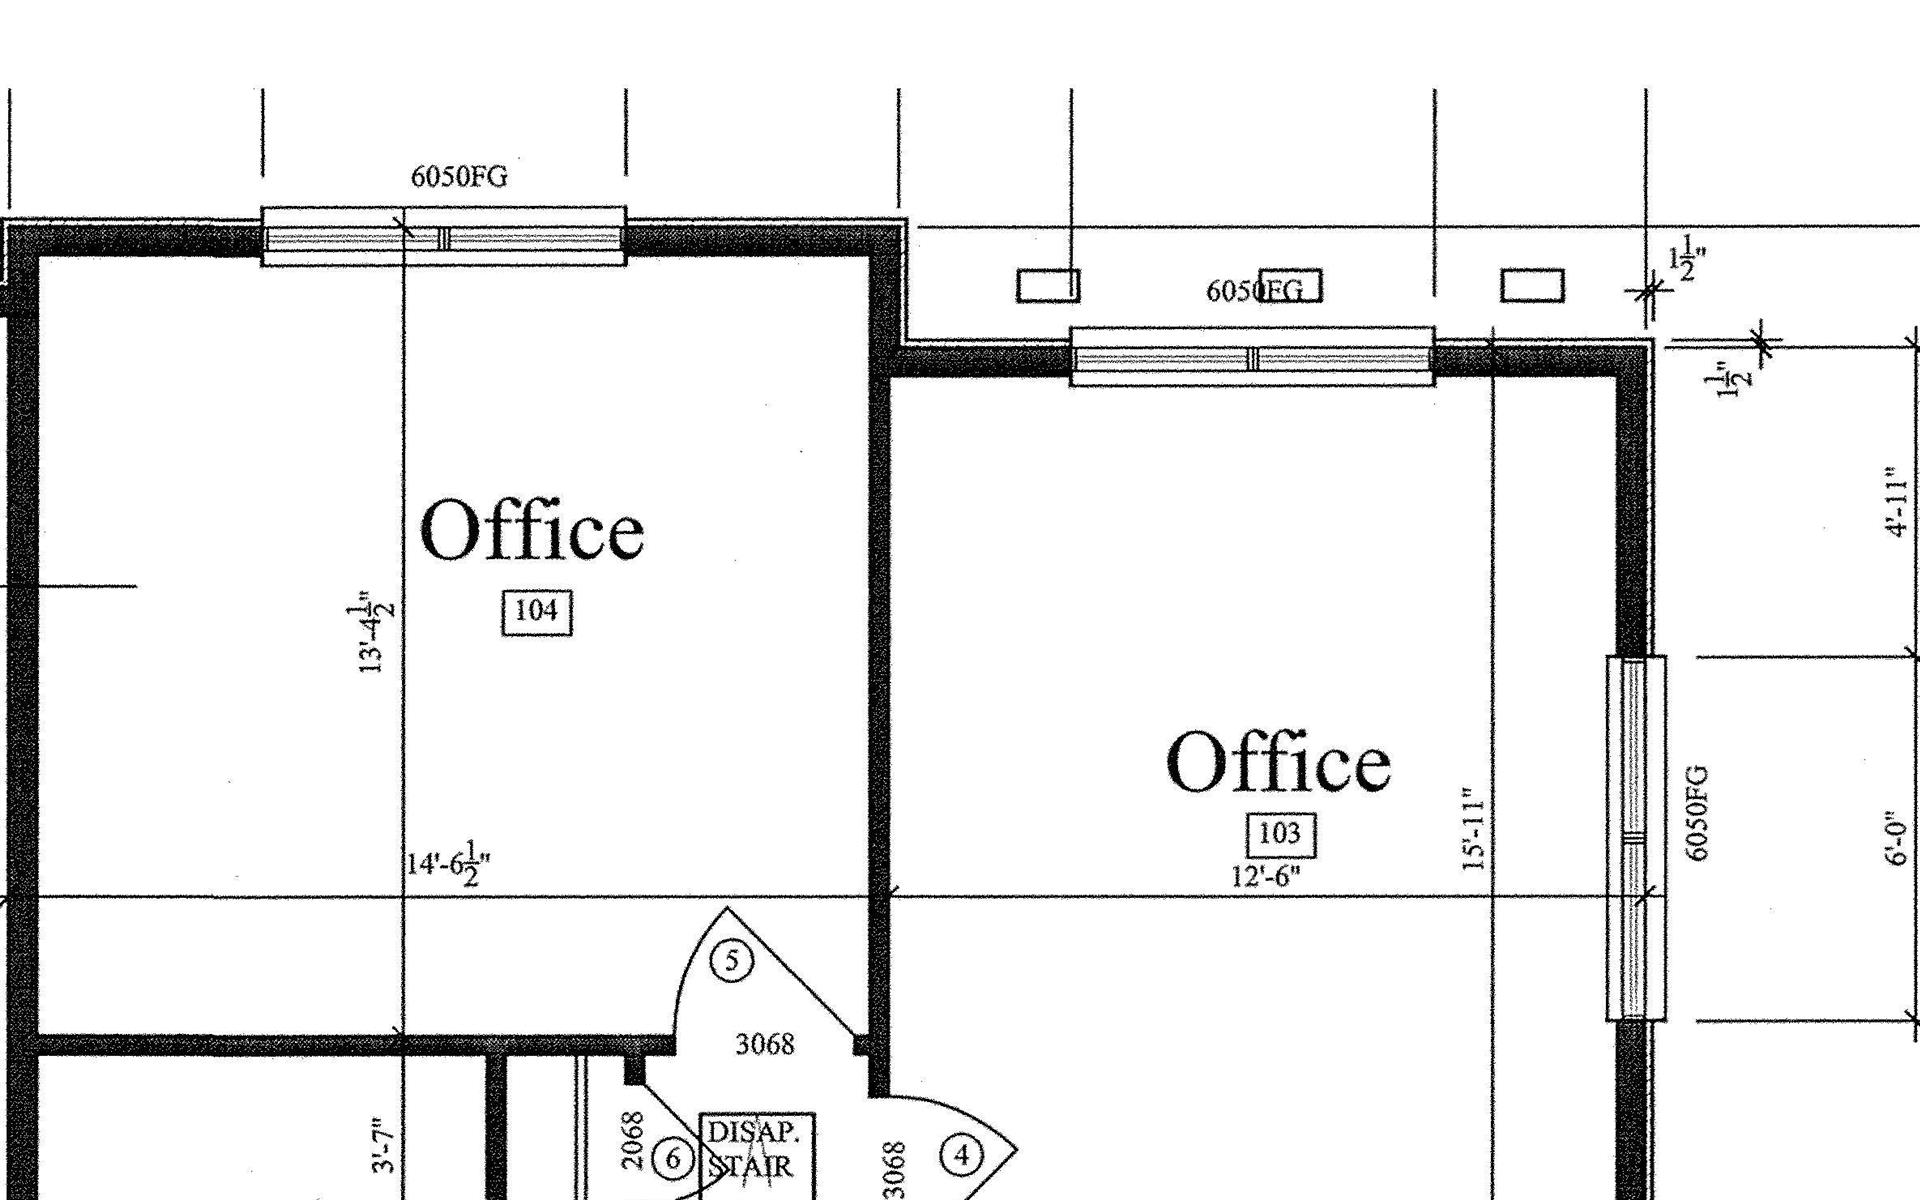 Zreyas - Office 2